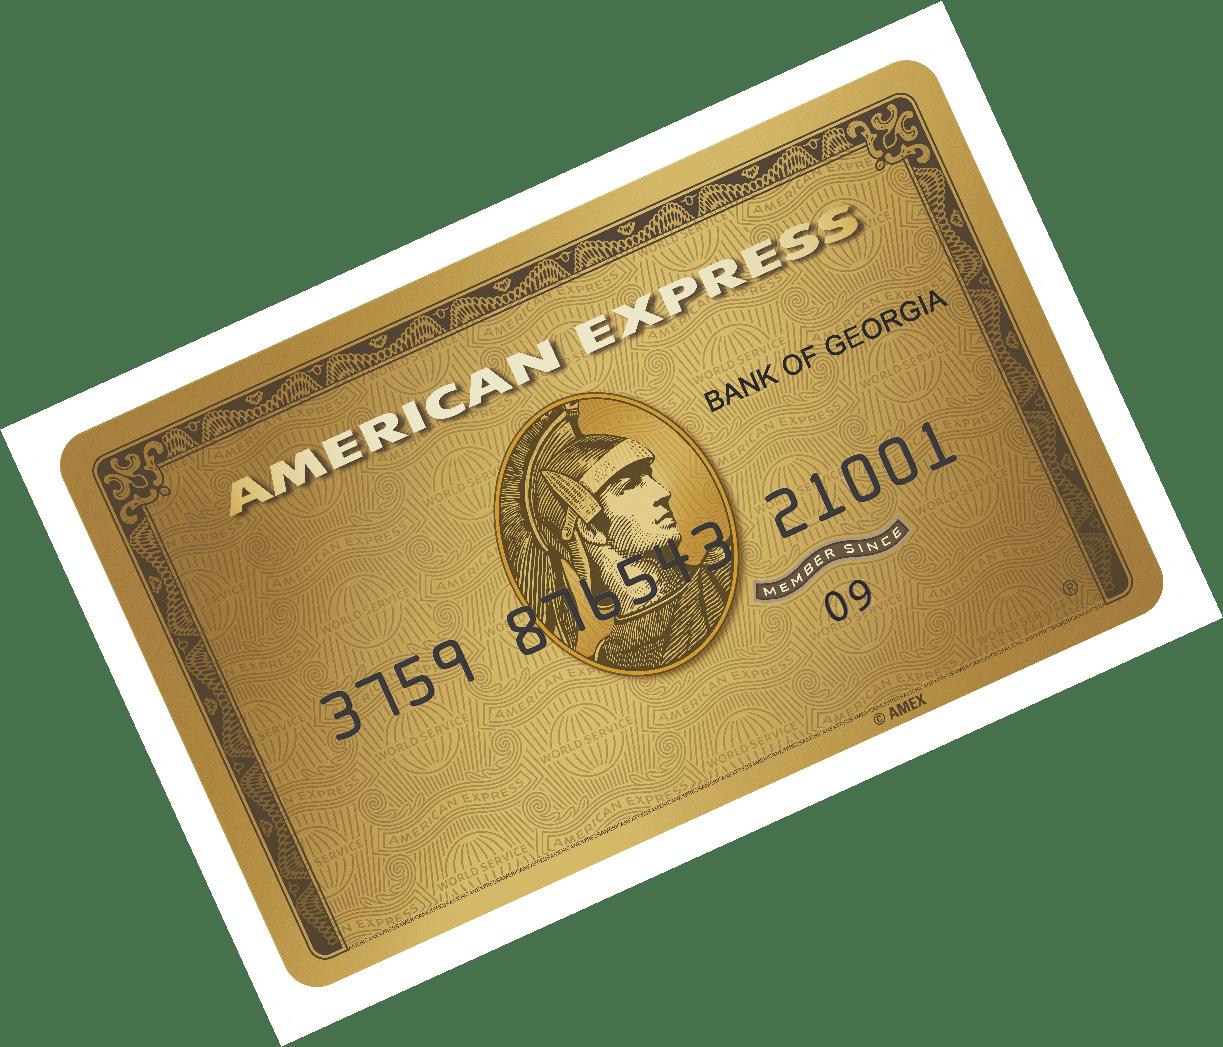 American Express Gold Karte